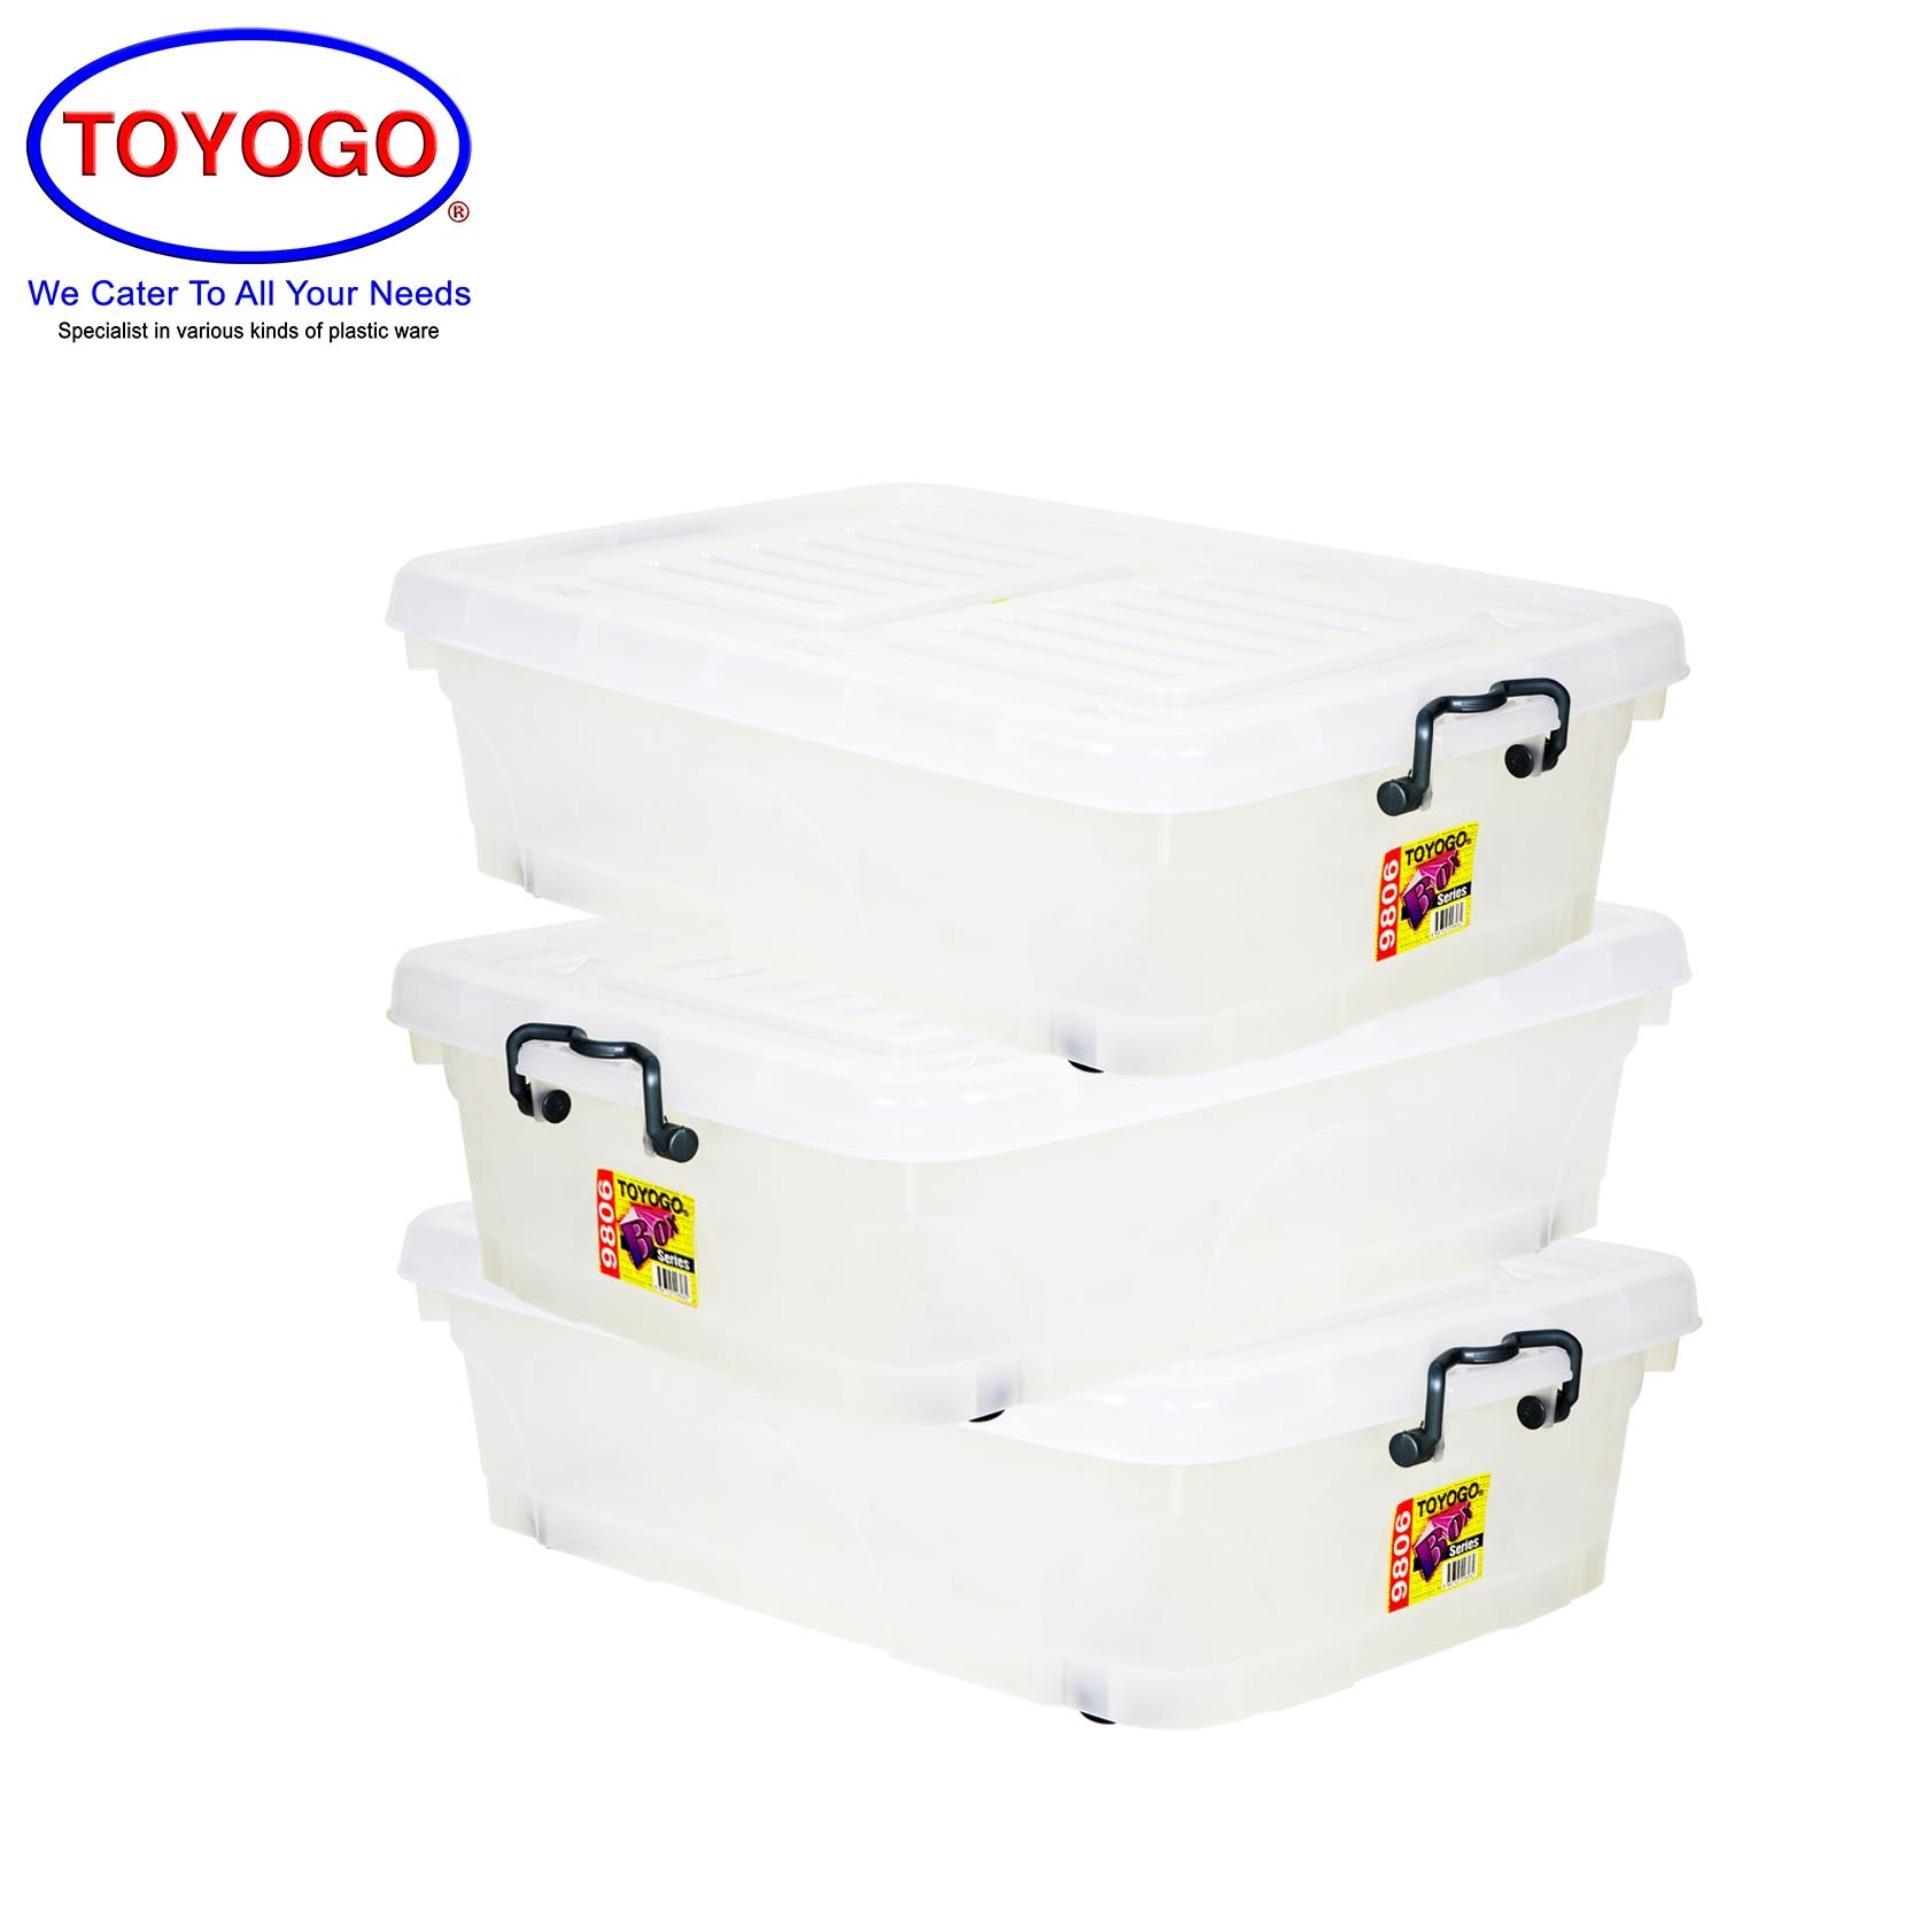 Toyogo Storage Box With Wheels (Bundle of 3) (9806)